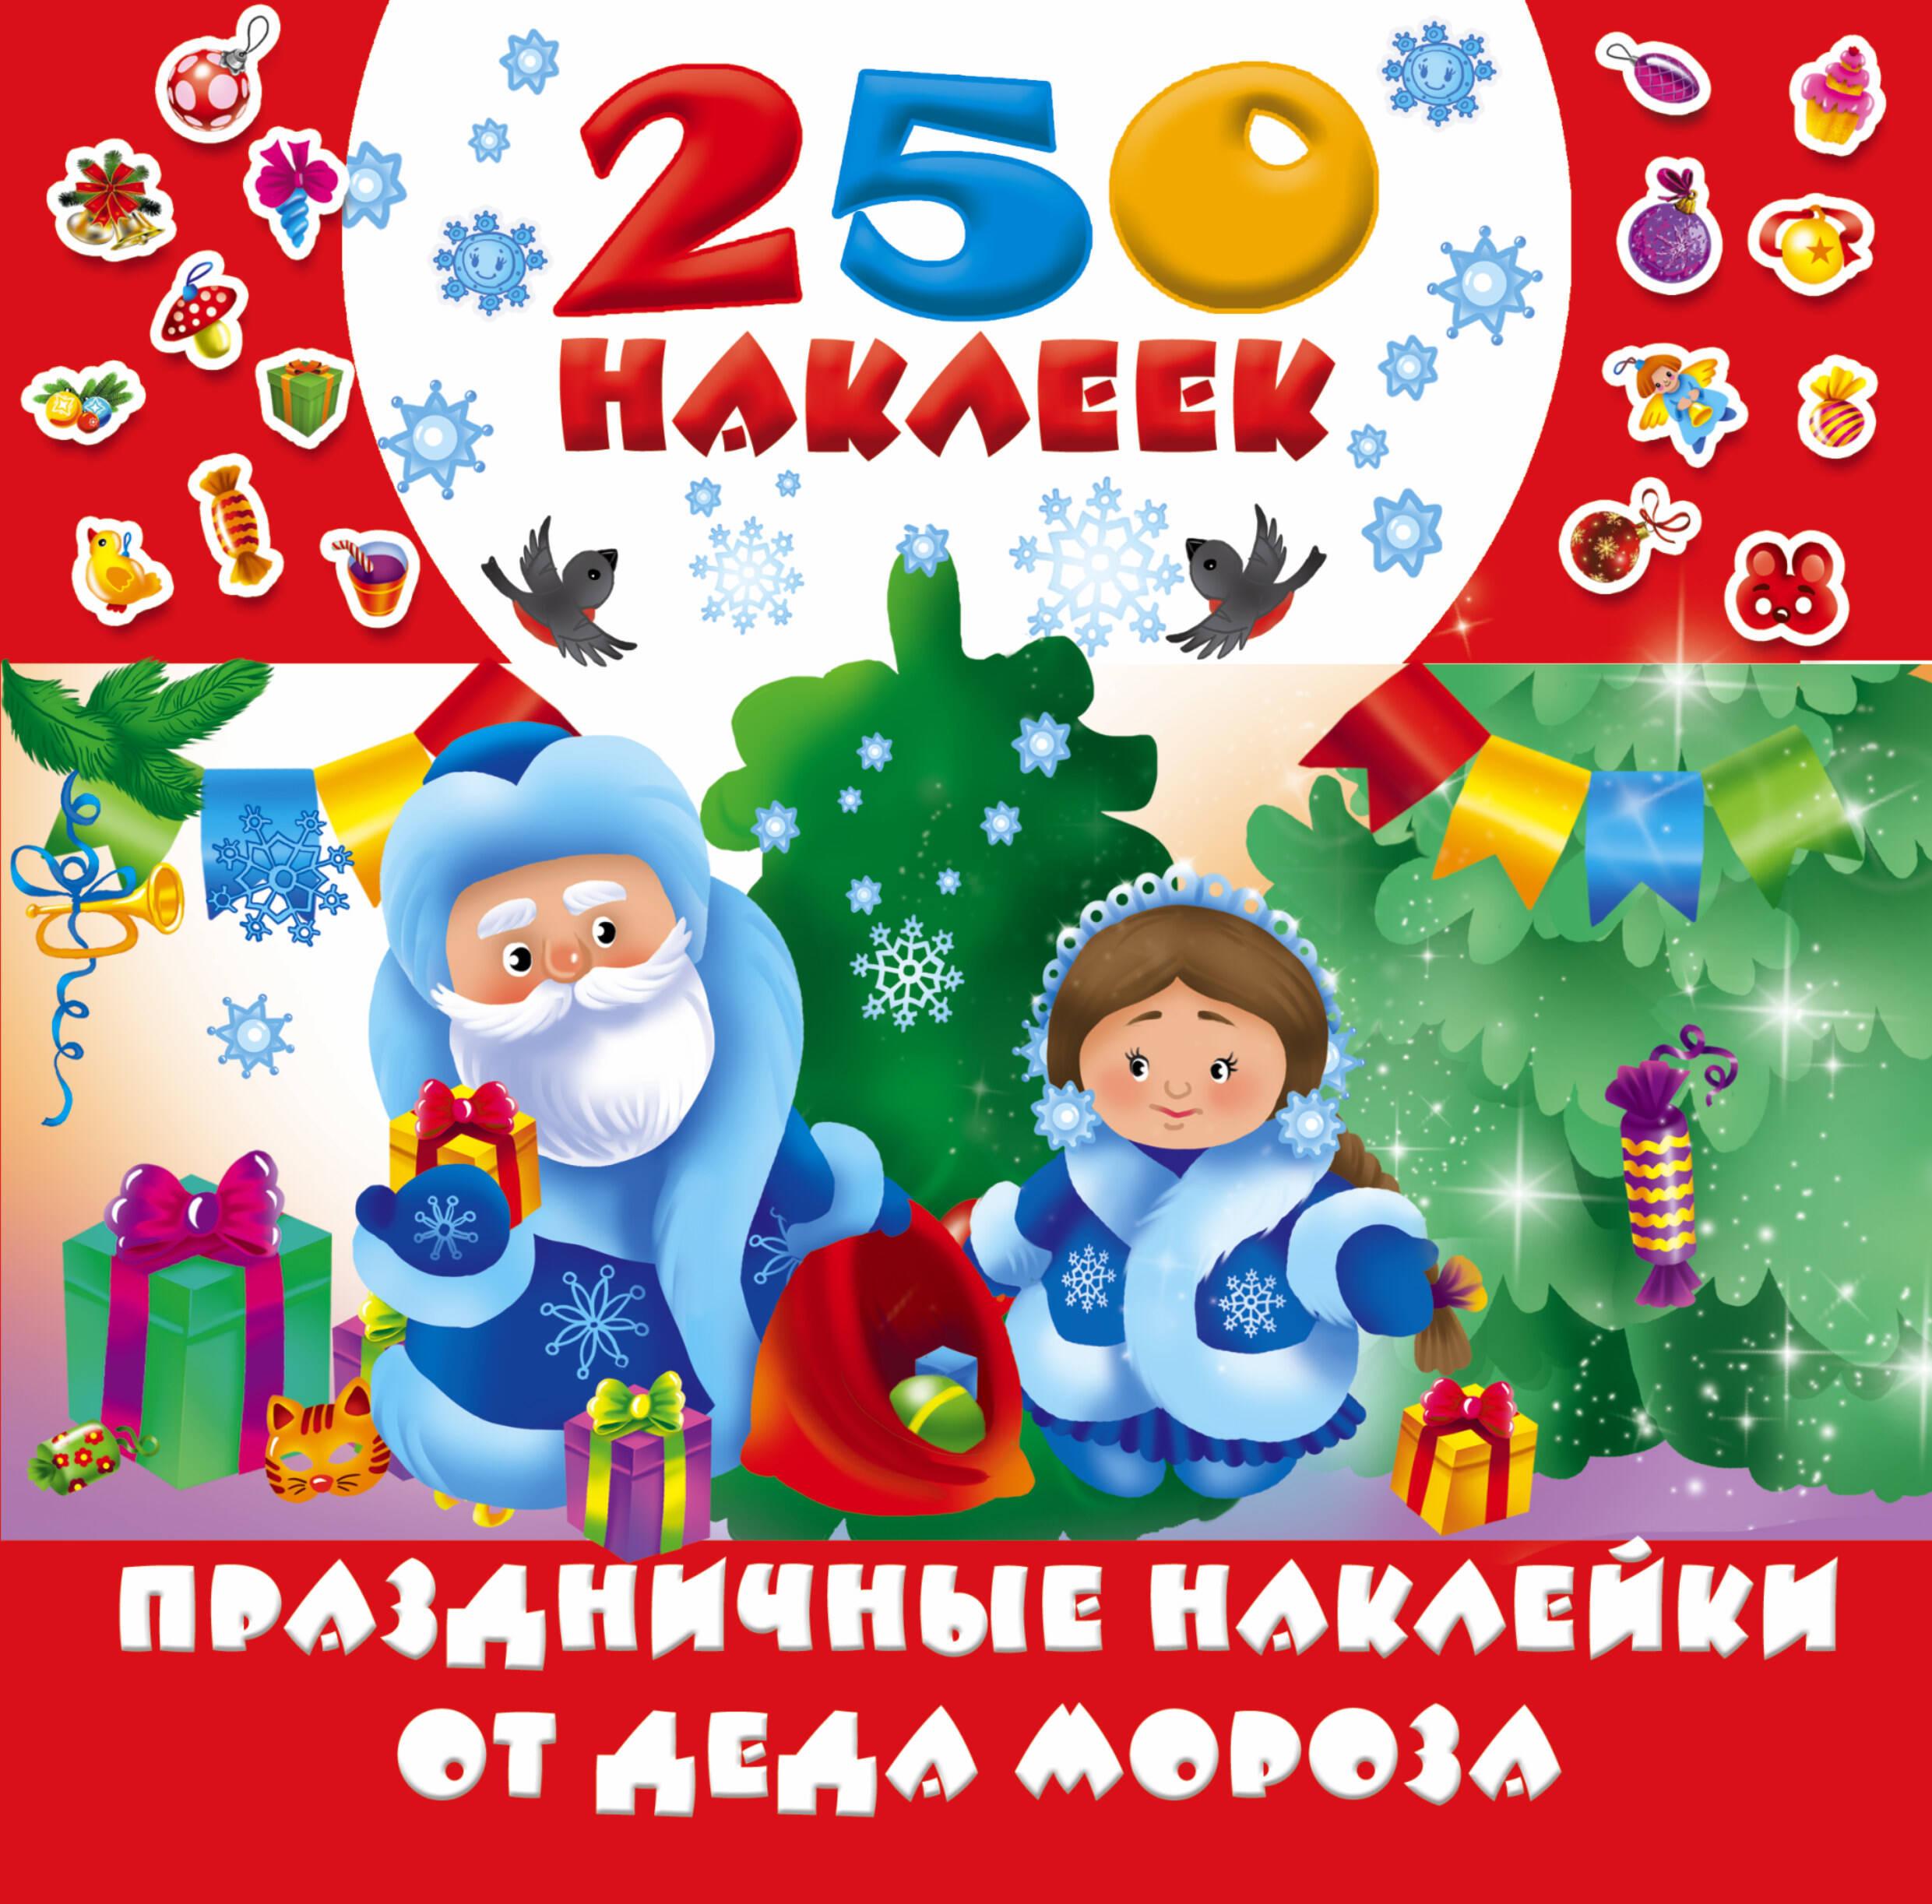 Дмитриева В.Г., Горбунова И.В. Праздничные наклейки от Деда Мороза